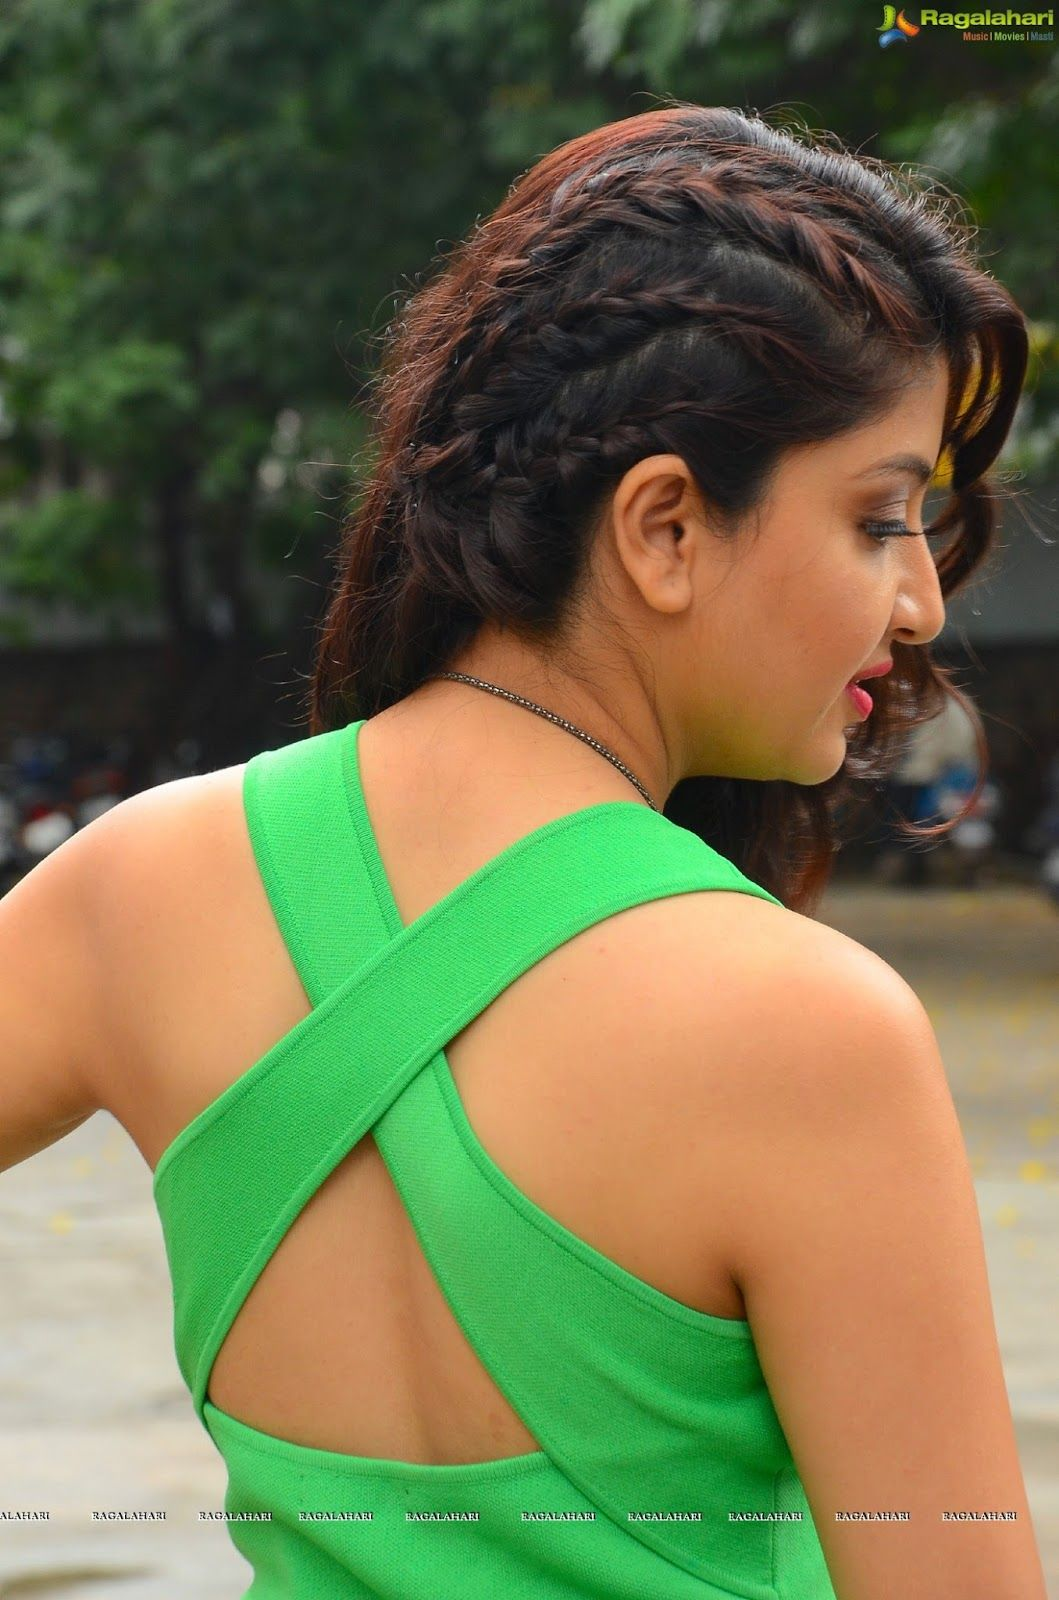 south indian actress poonam kaur pics | poonam kaur images | poonam